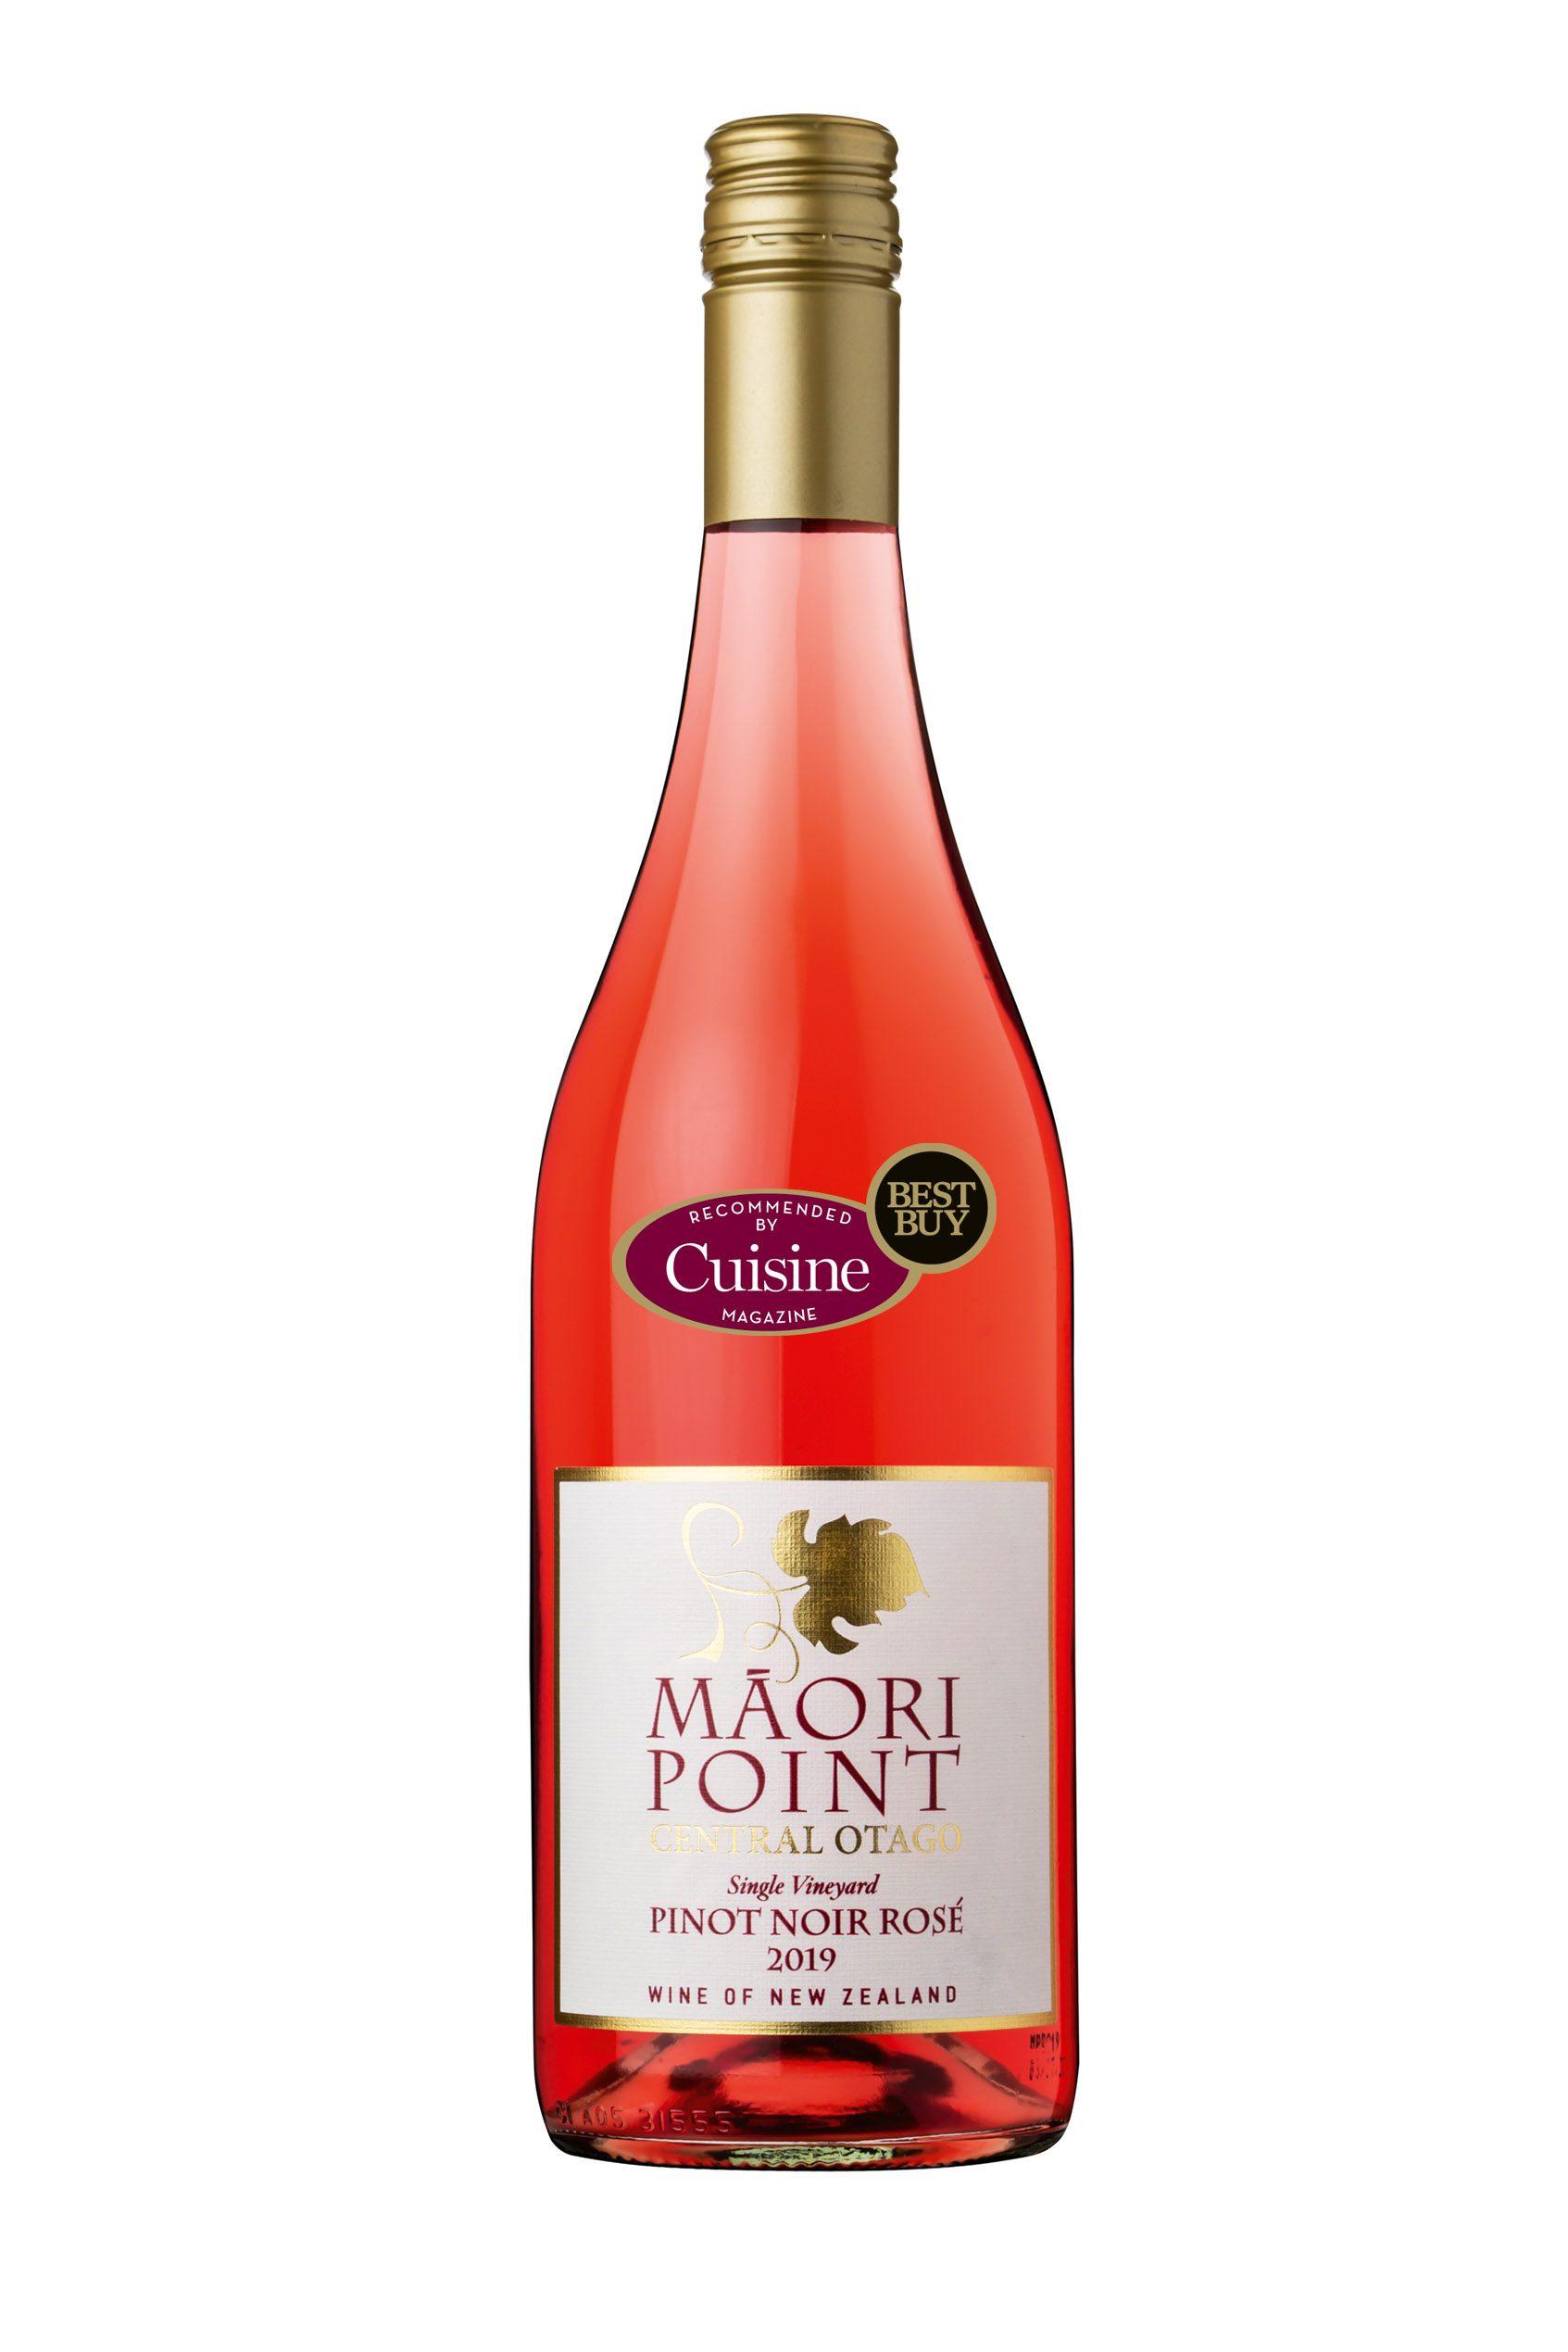 Maori Point Pinot Noir Rosé 2019 (Central Otago)